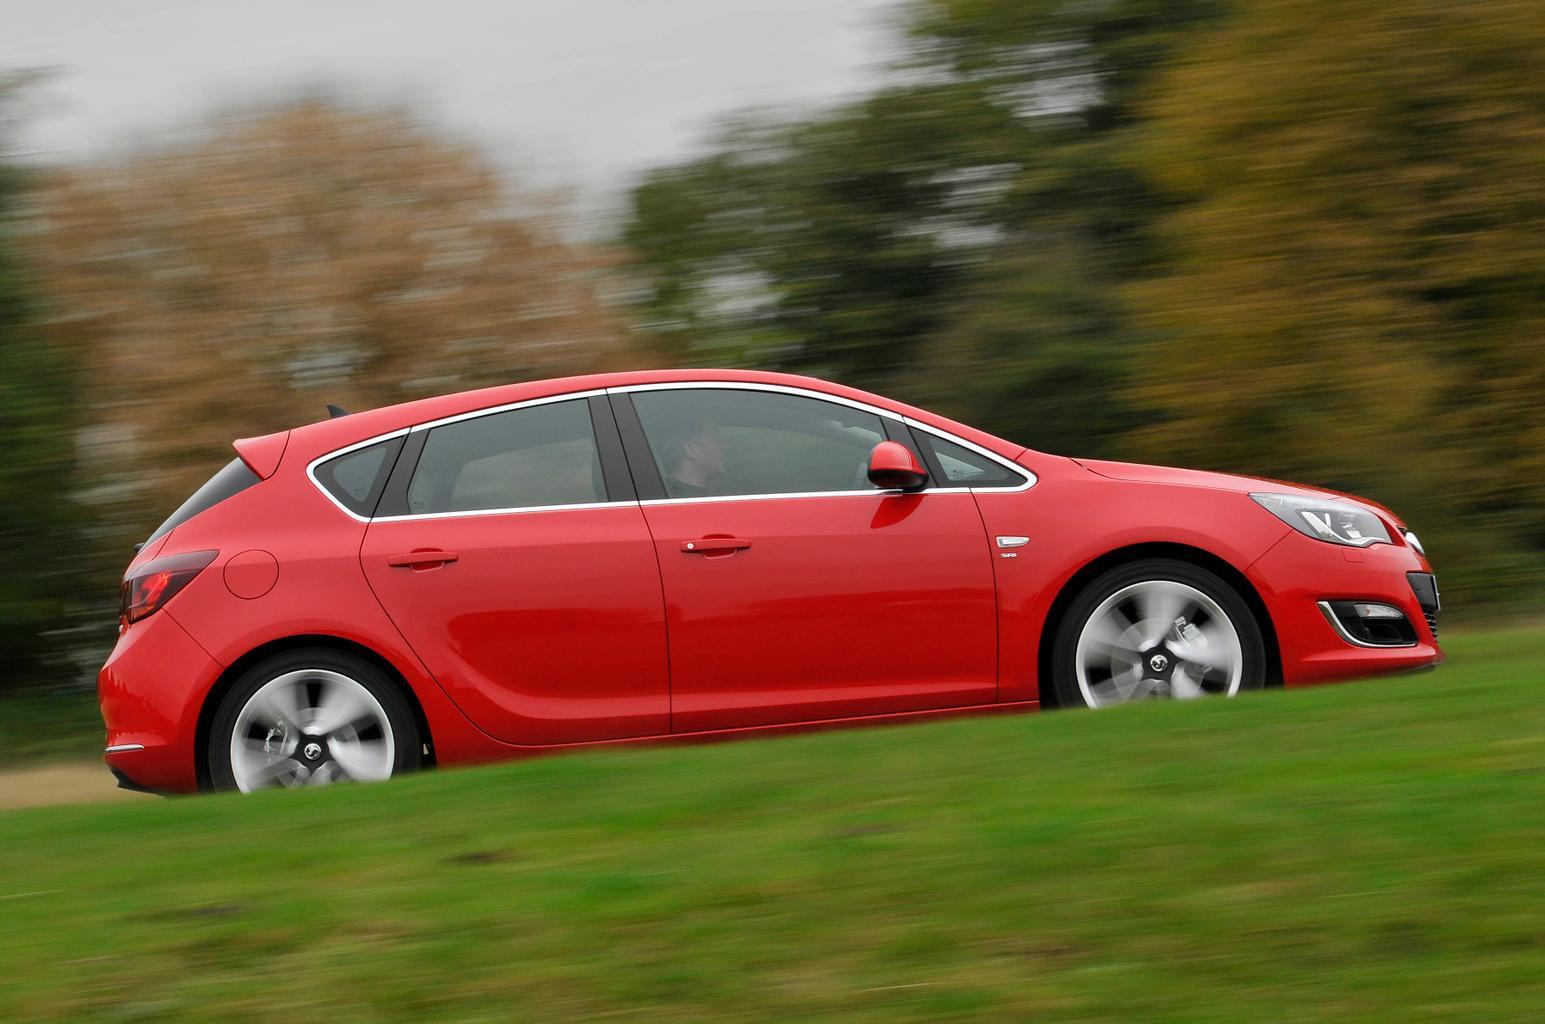 Vauxhall Astra (09 - 15)